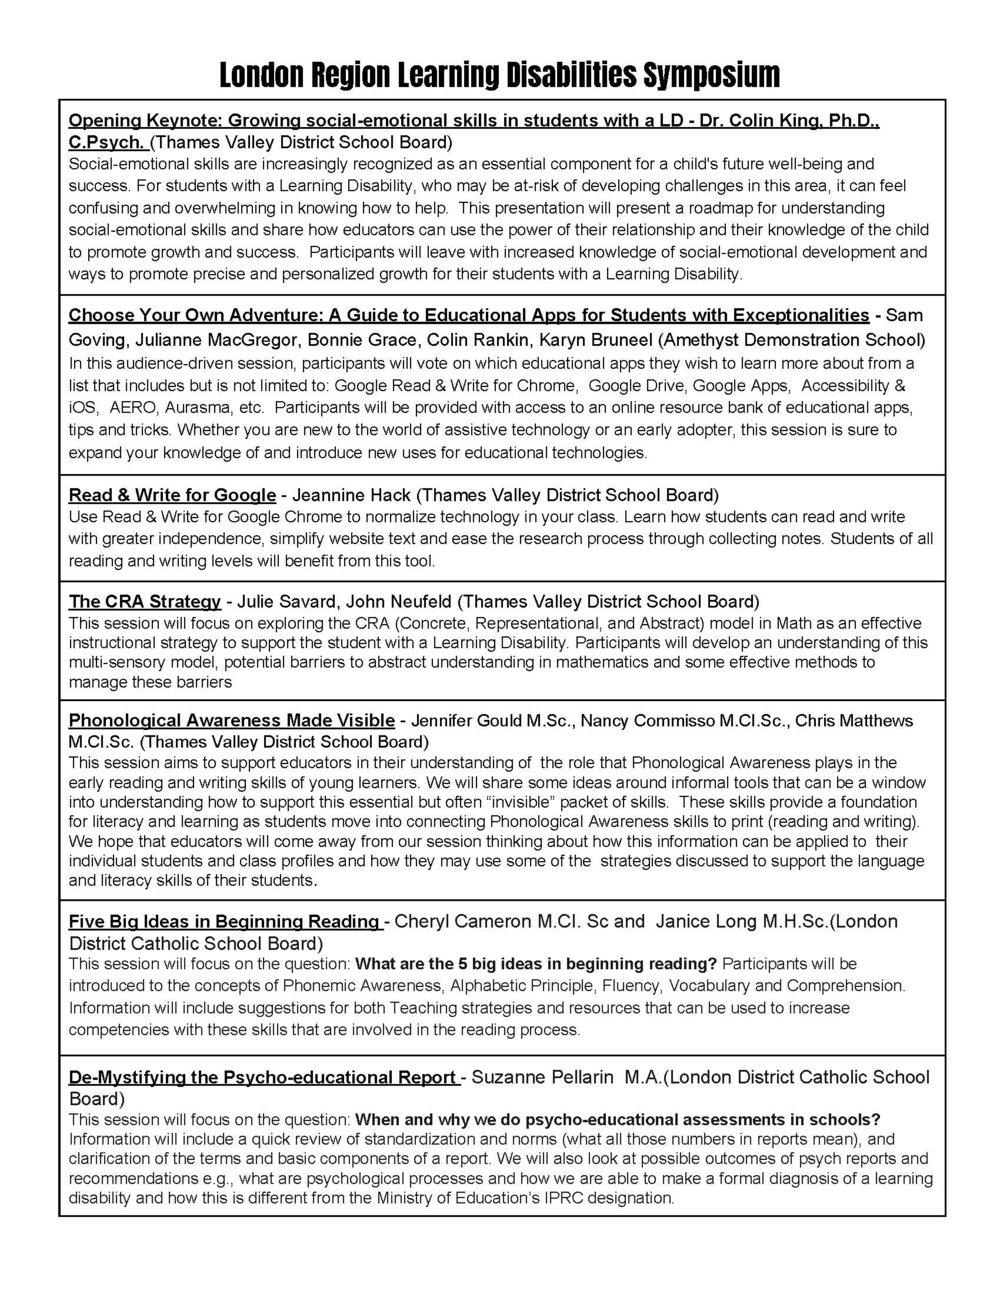 LondonRegionLearningDisabilitiesSymposiumworkshops_Page_1.jpg